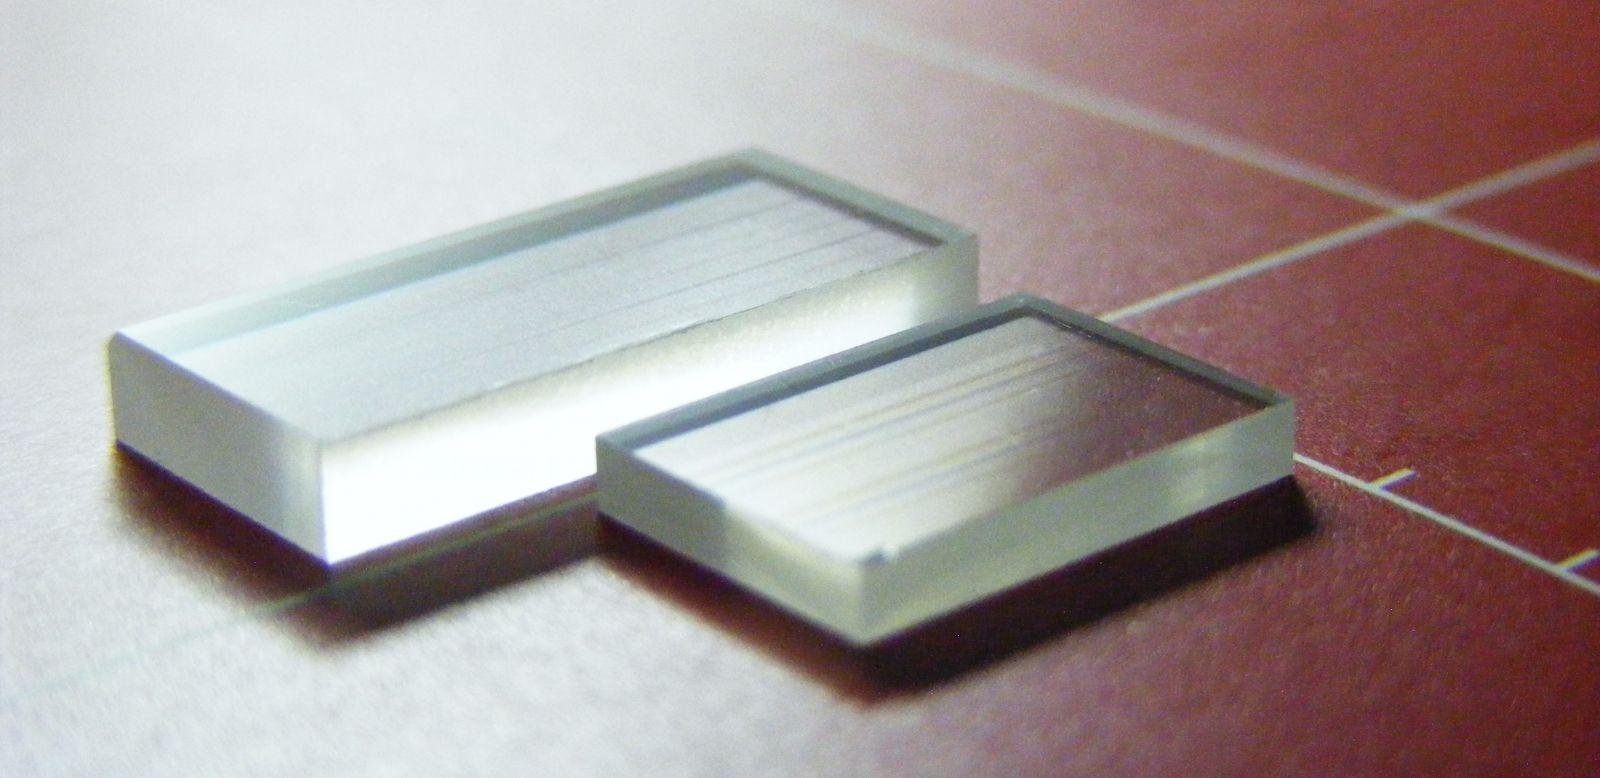 Stoichiometric Lithium Tantalate (SLT) | Deltronic Crystal Isowave